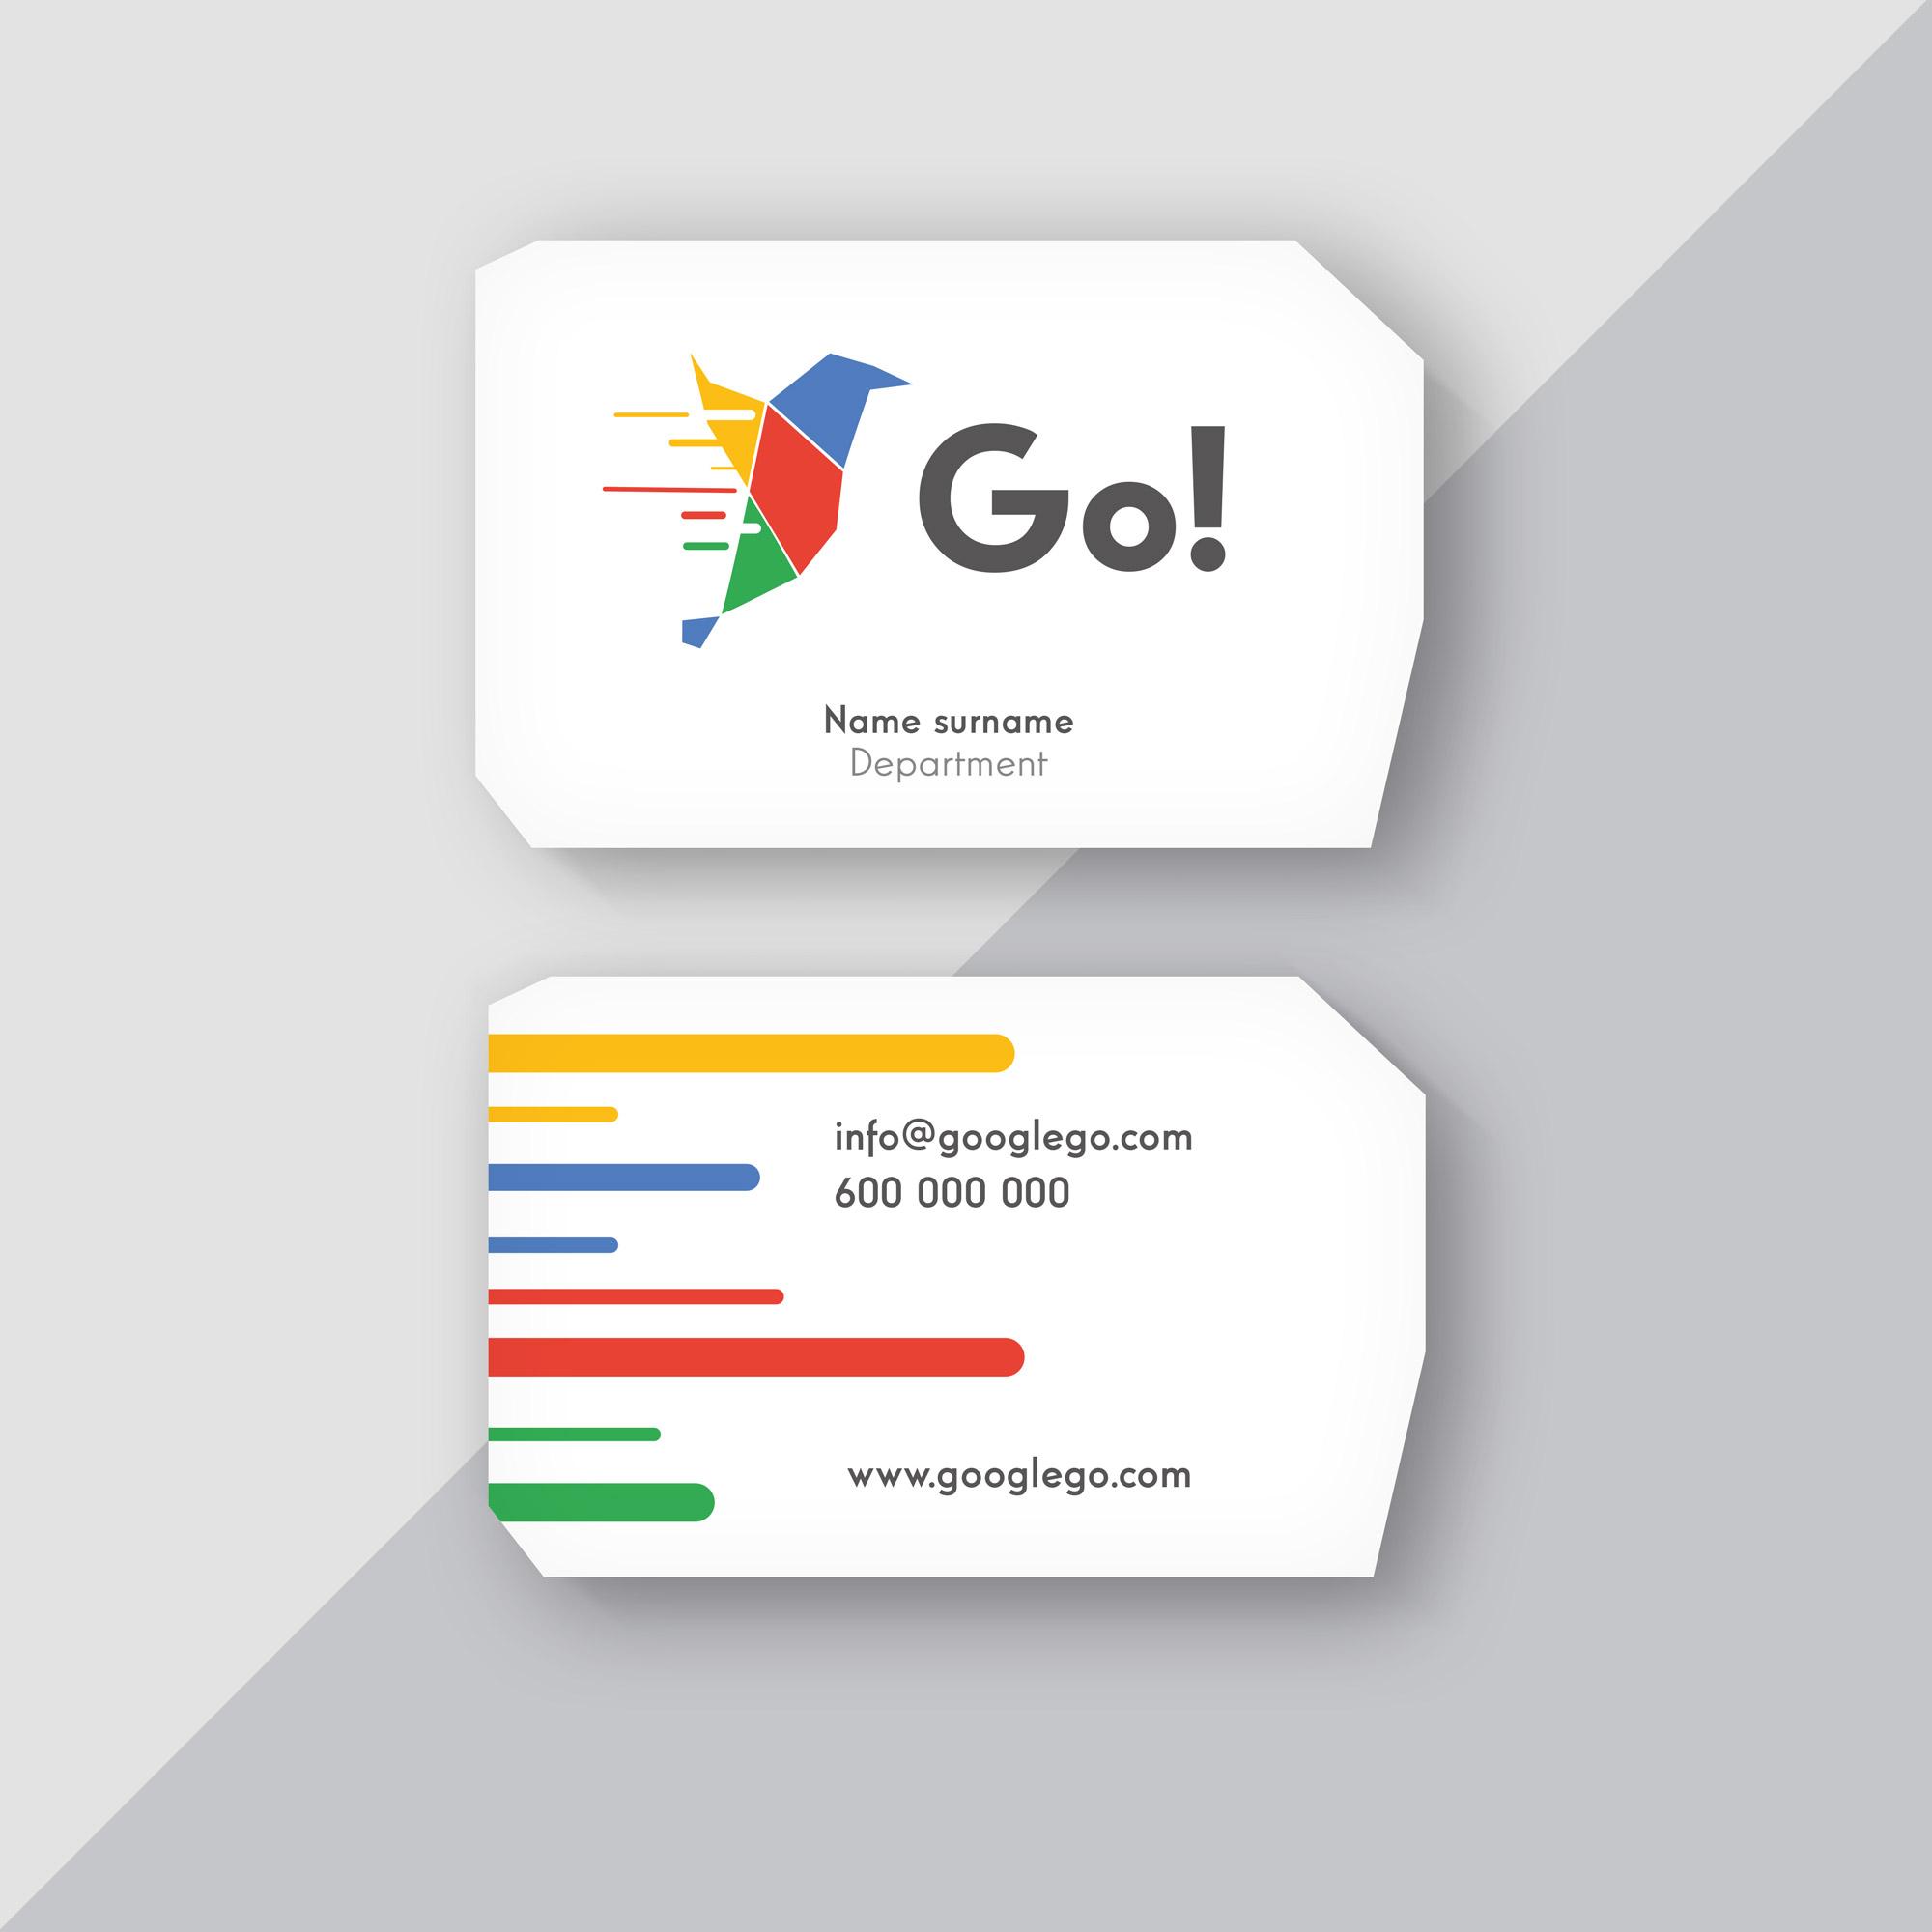 Mobile virtual operator Go! Google cards